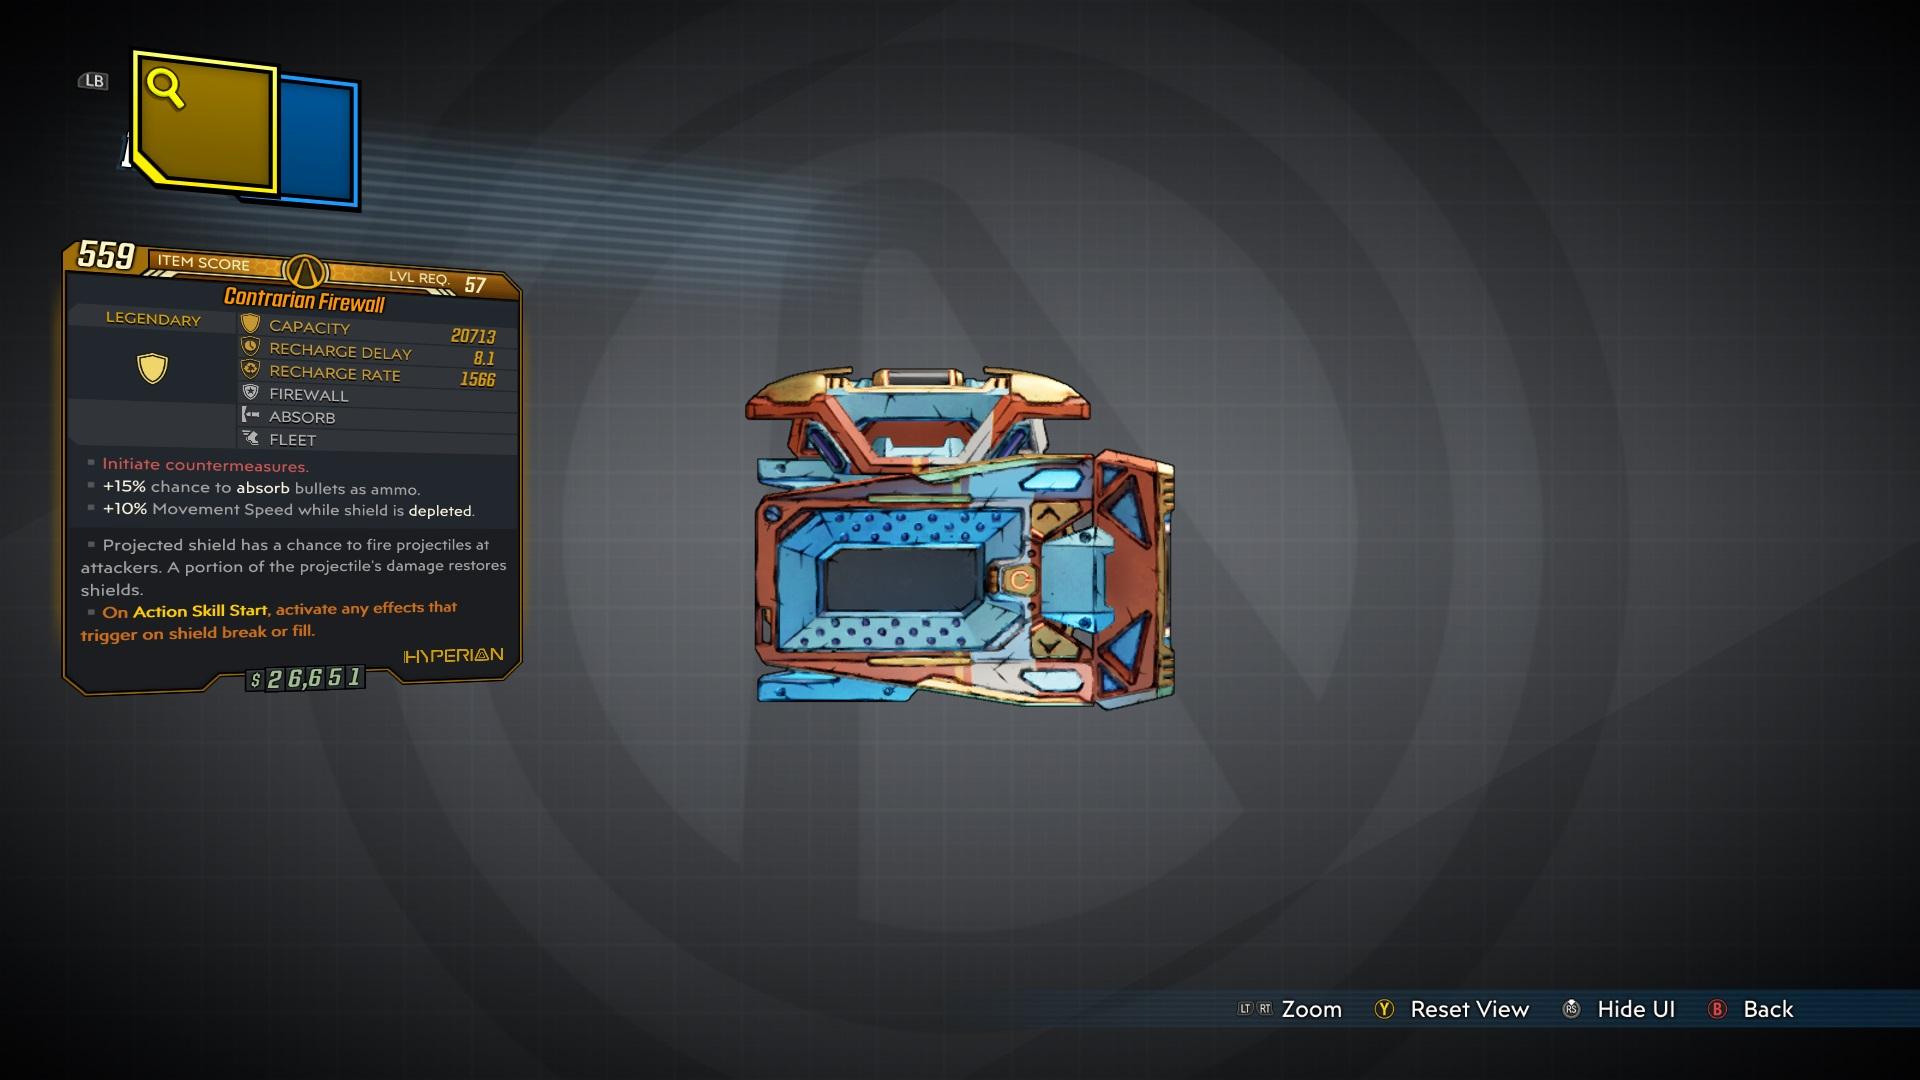 Legendario Firewall Shield Hyperion